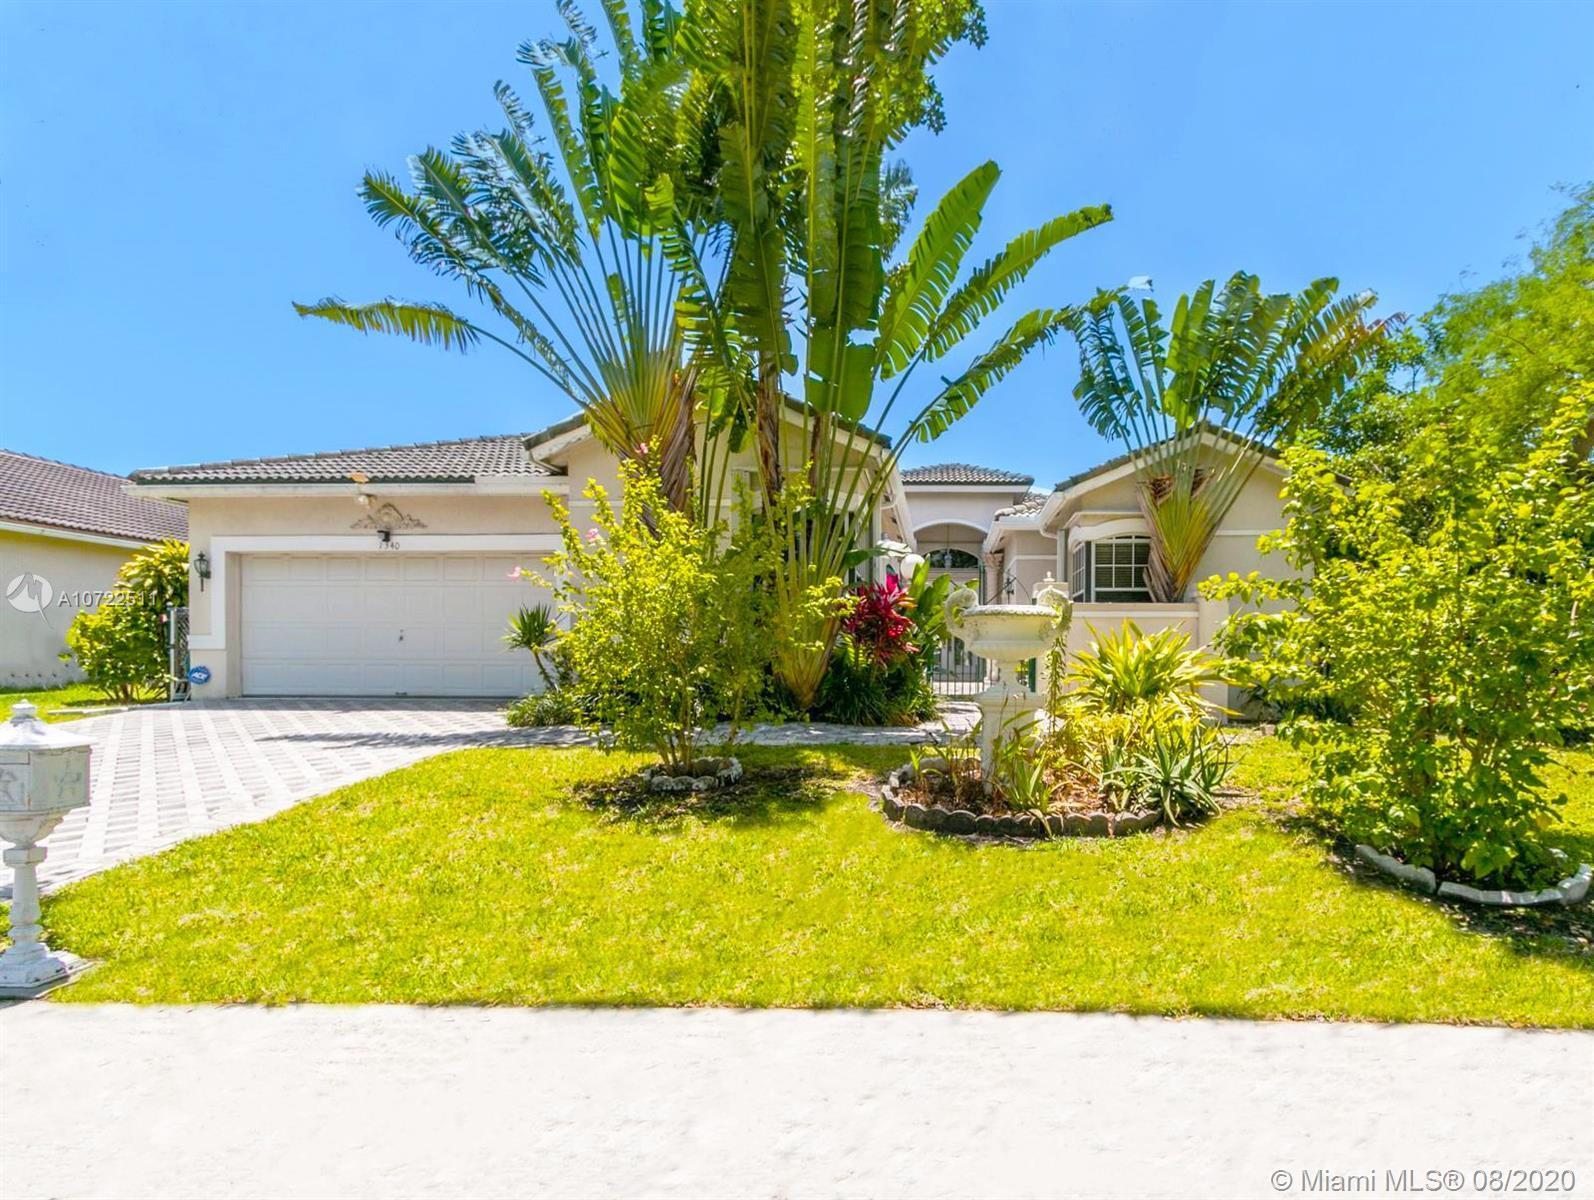 Hollywood Golf Estates - 1340 Funston St, Hollywood, FL 33019